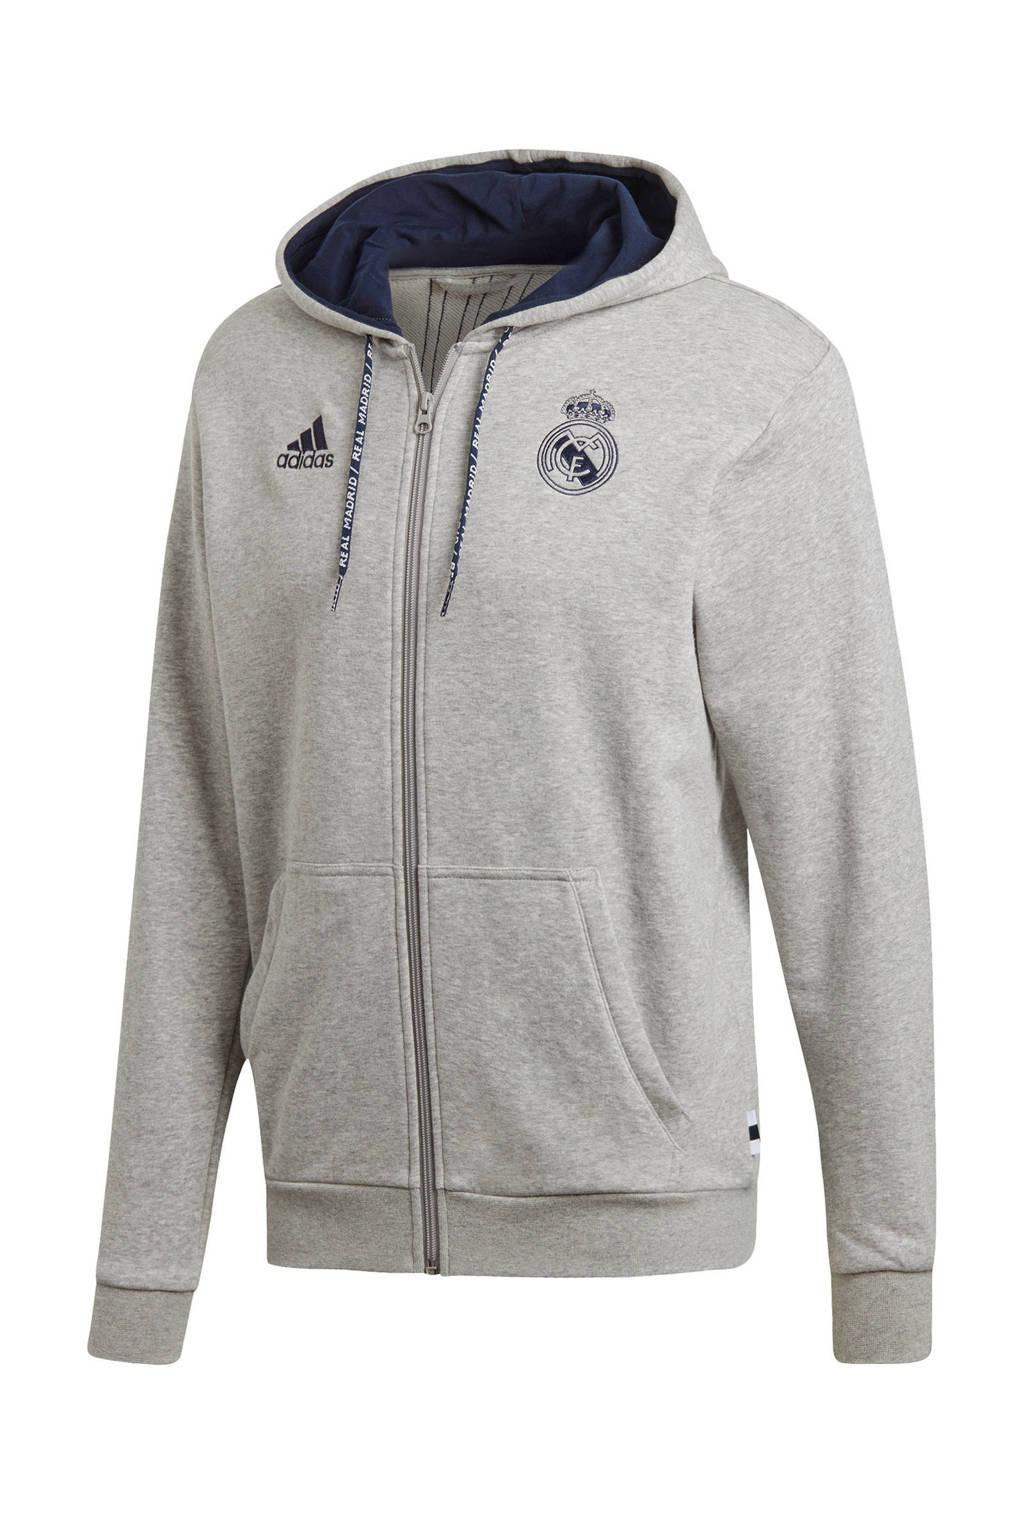 adidas Senior Real Madrid voetbalvest, Grijs melange/donkerblauw